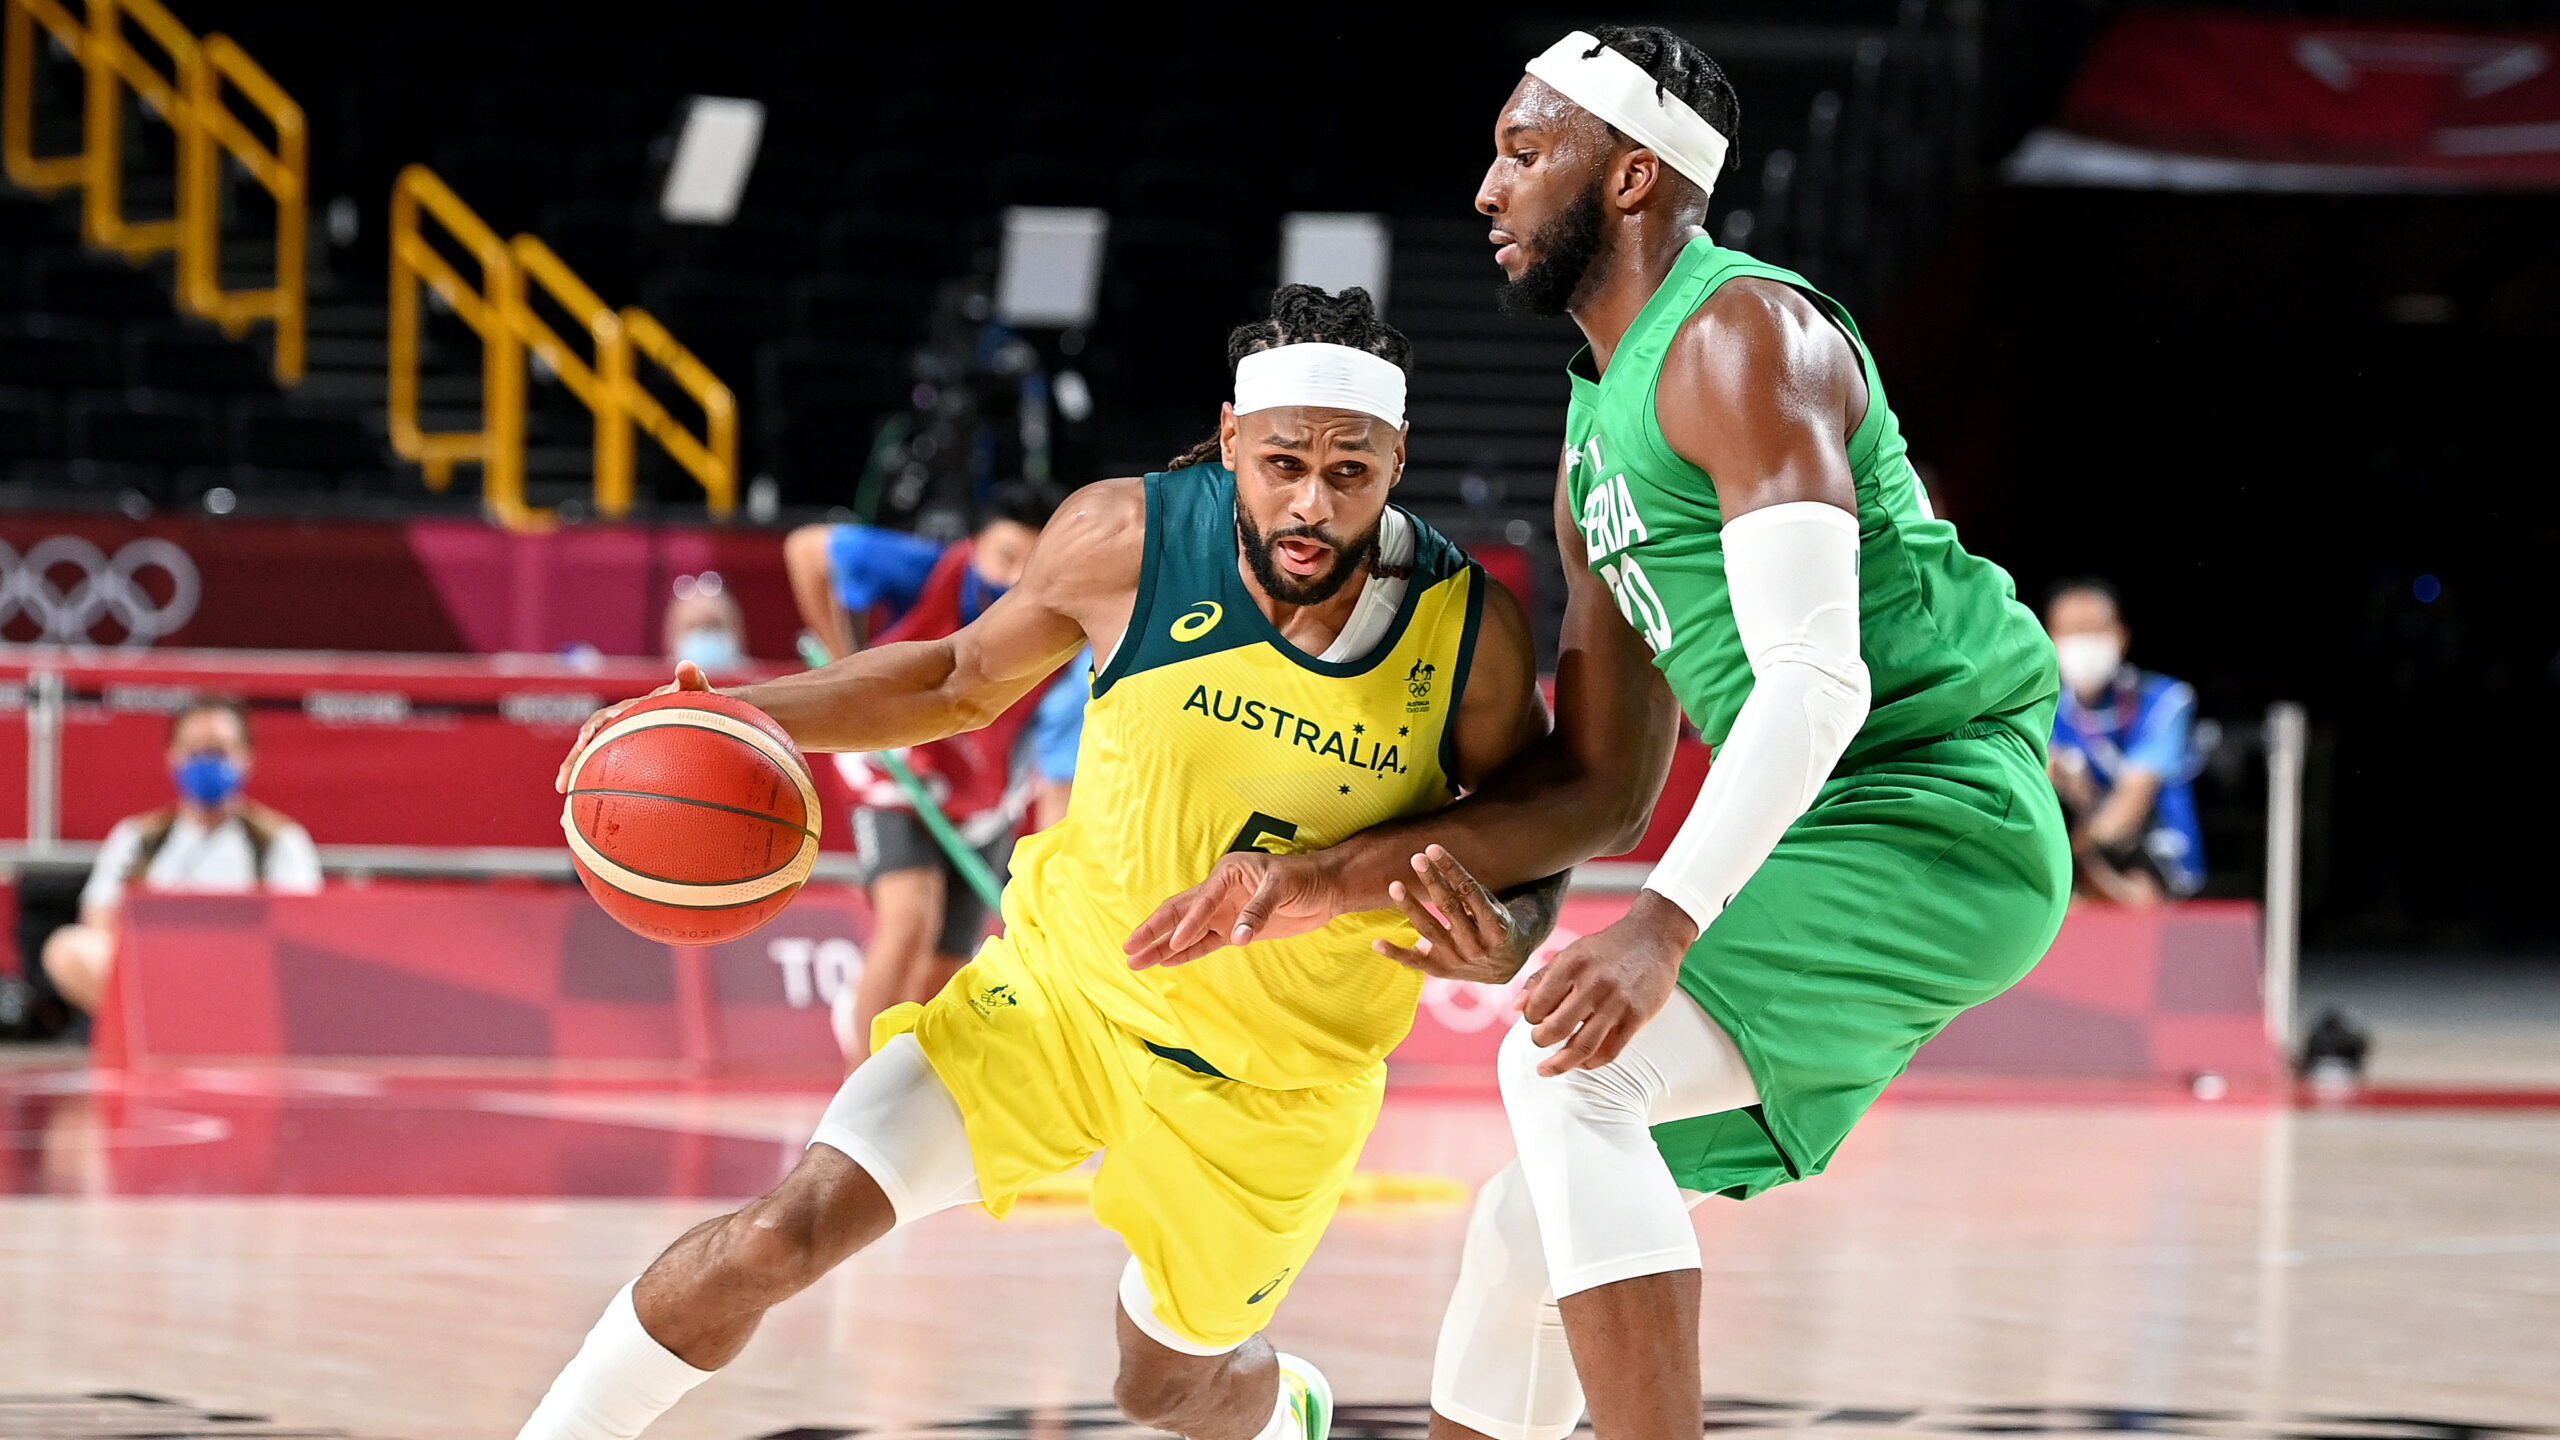 Olympic men's basketball tips off in Tokyo as Australia, Italy, Czech Republic win